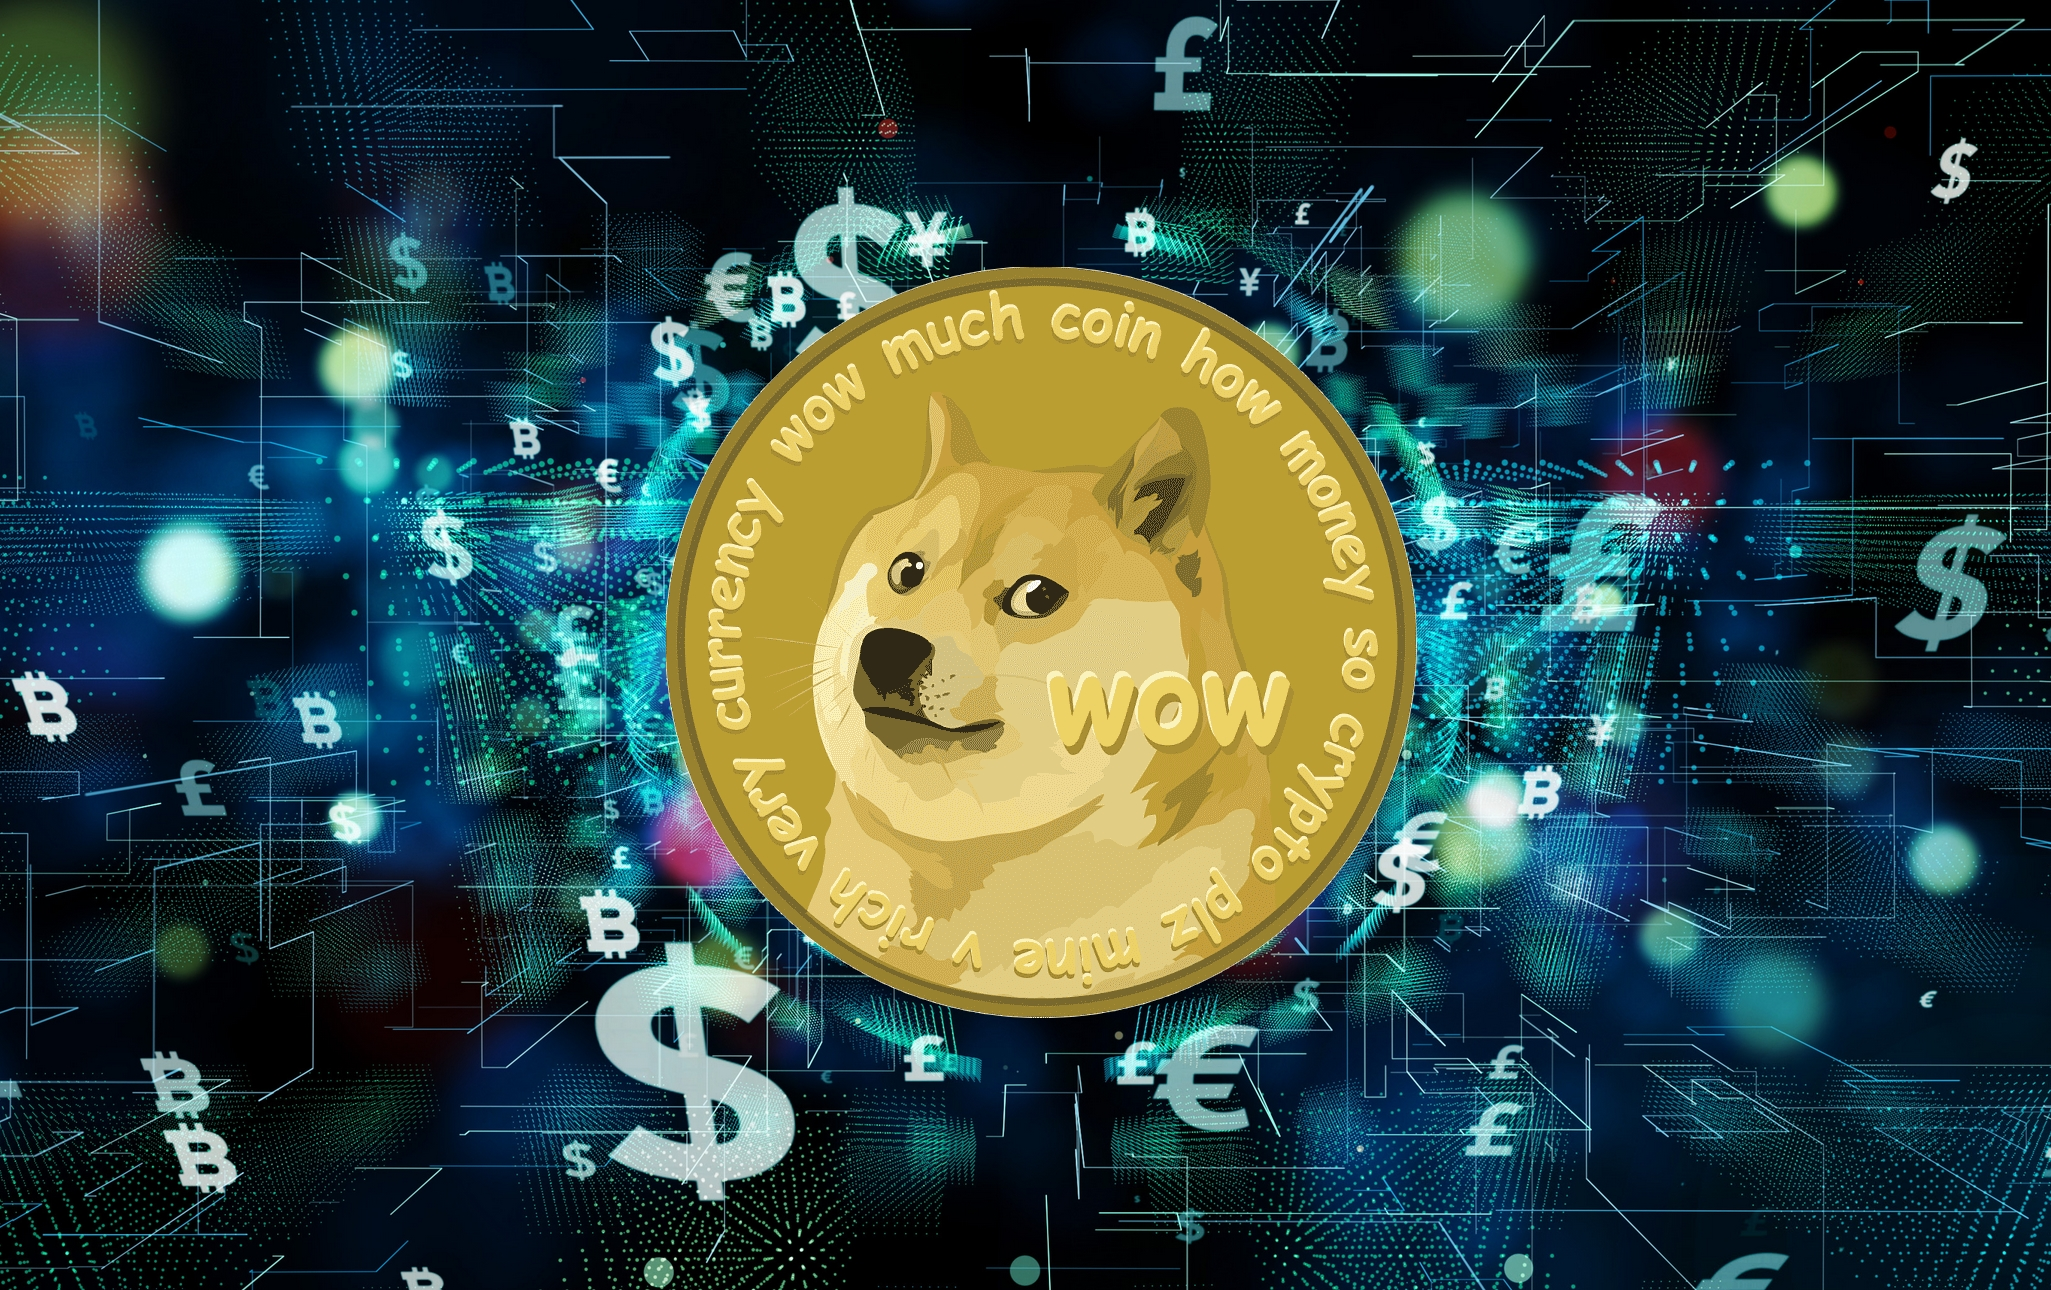 Dogecoin registra alza tras su incorporación en Coinbase